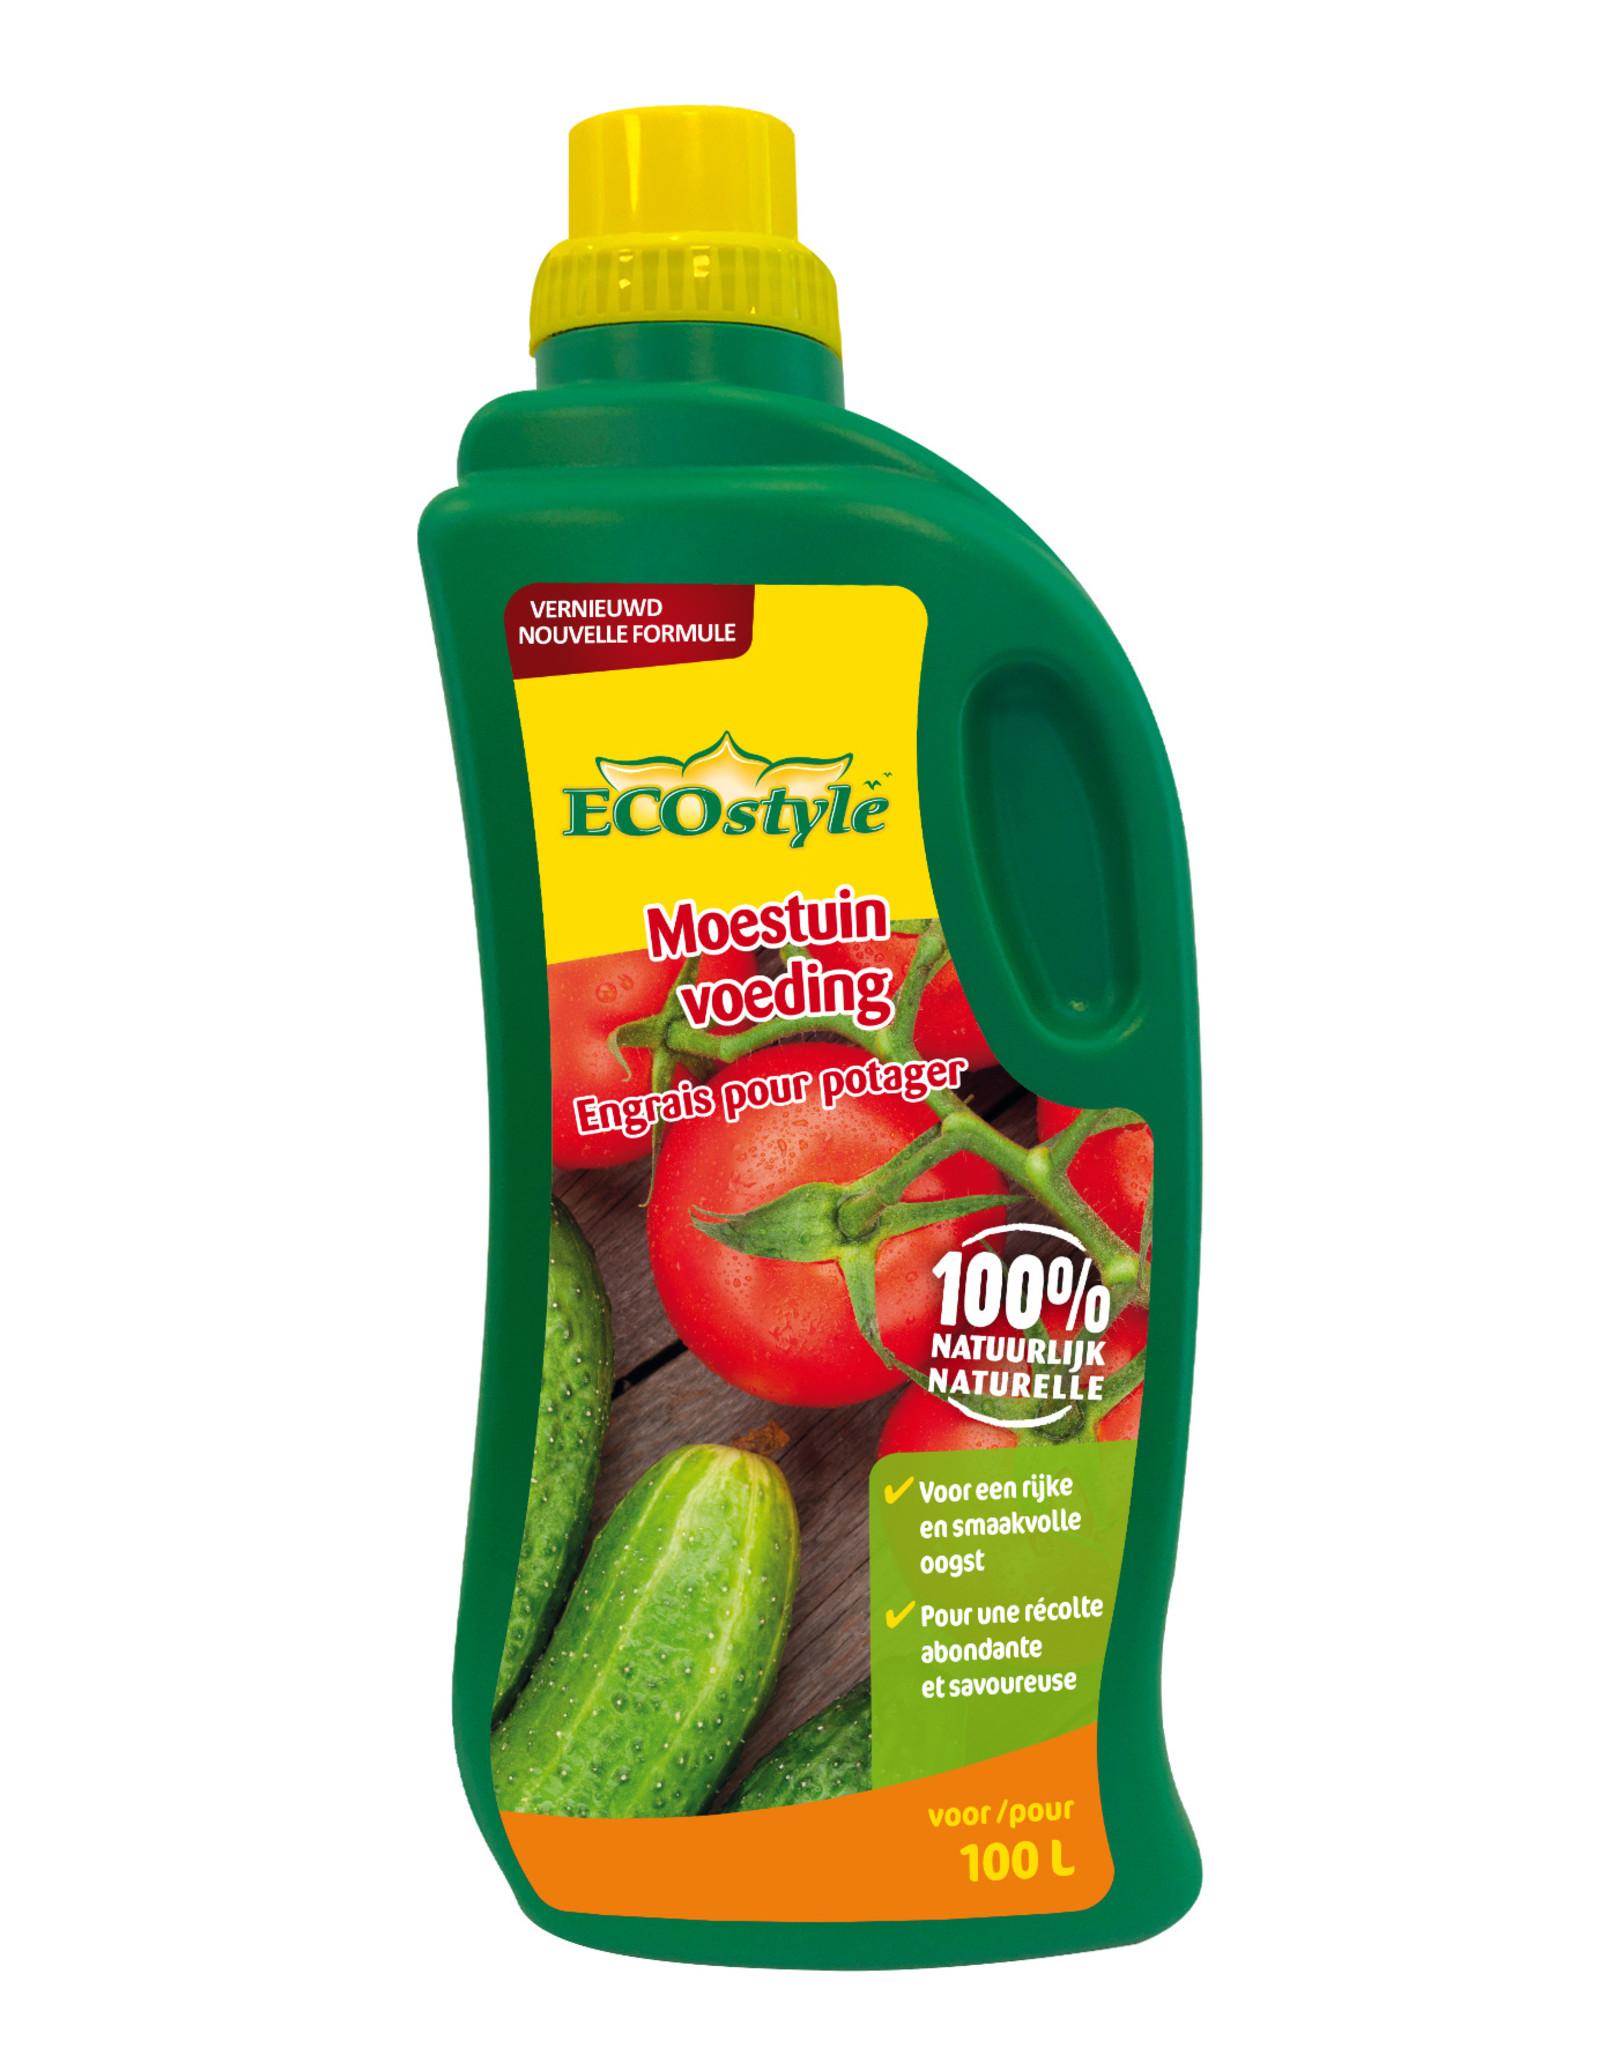 Ecostyle Moestuinvoeding 1 liter